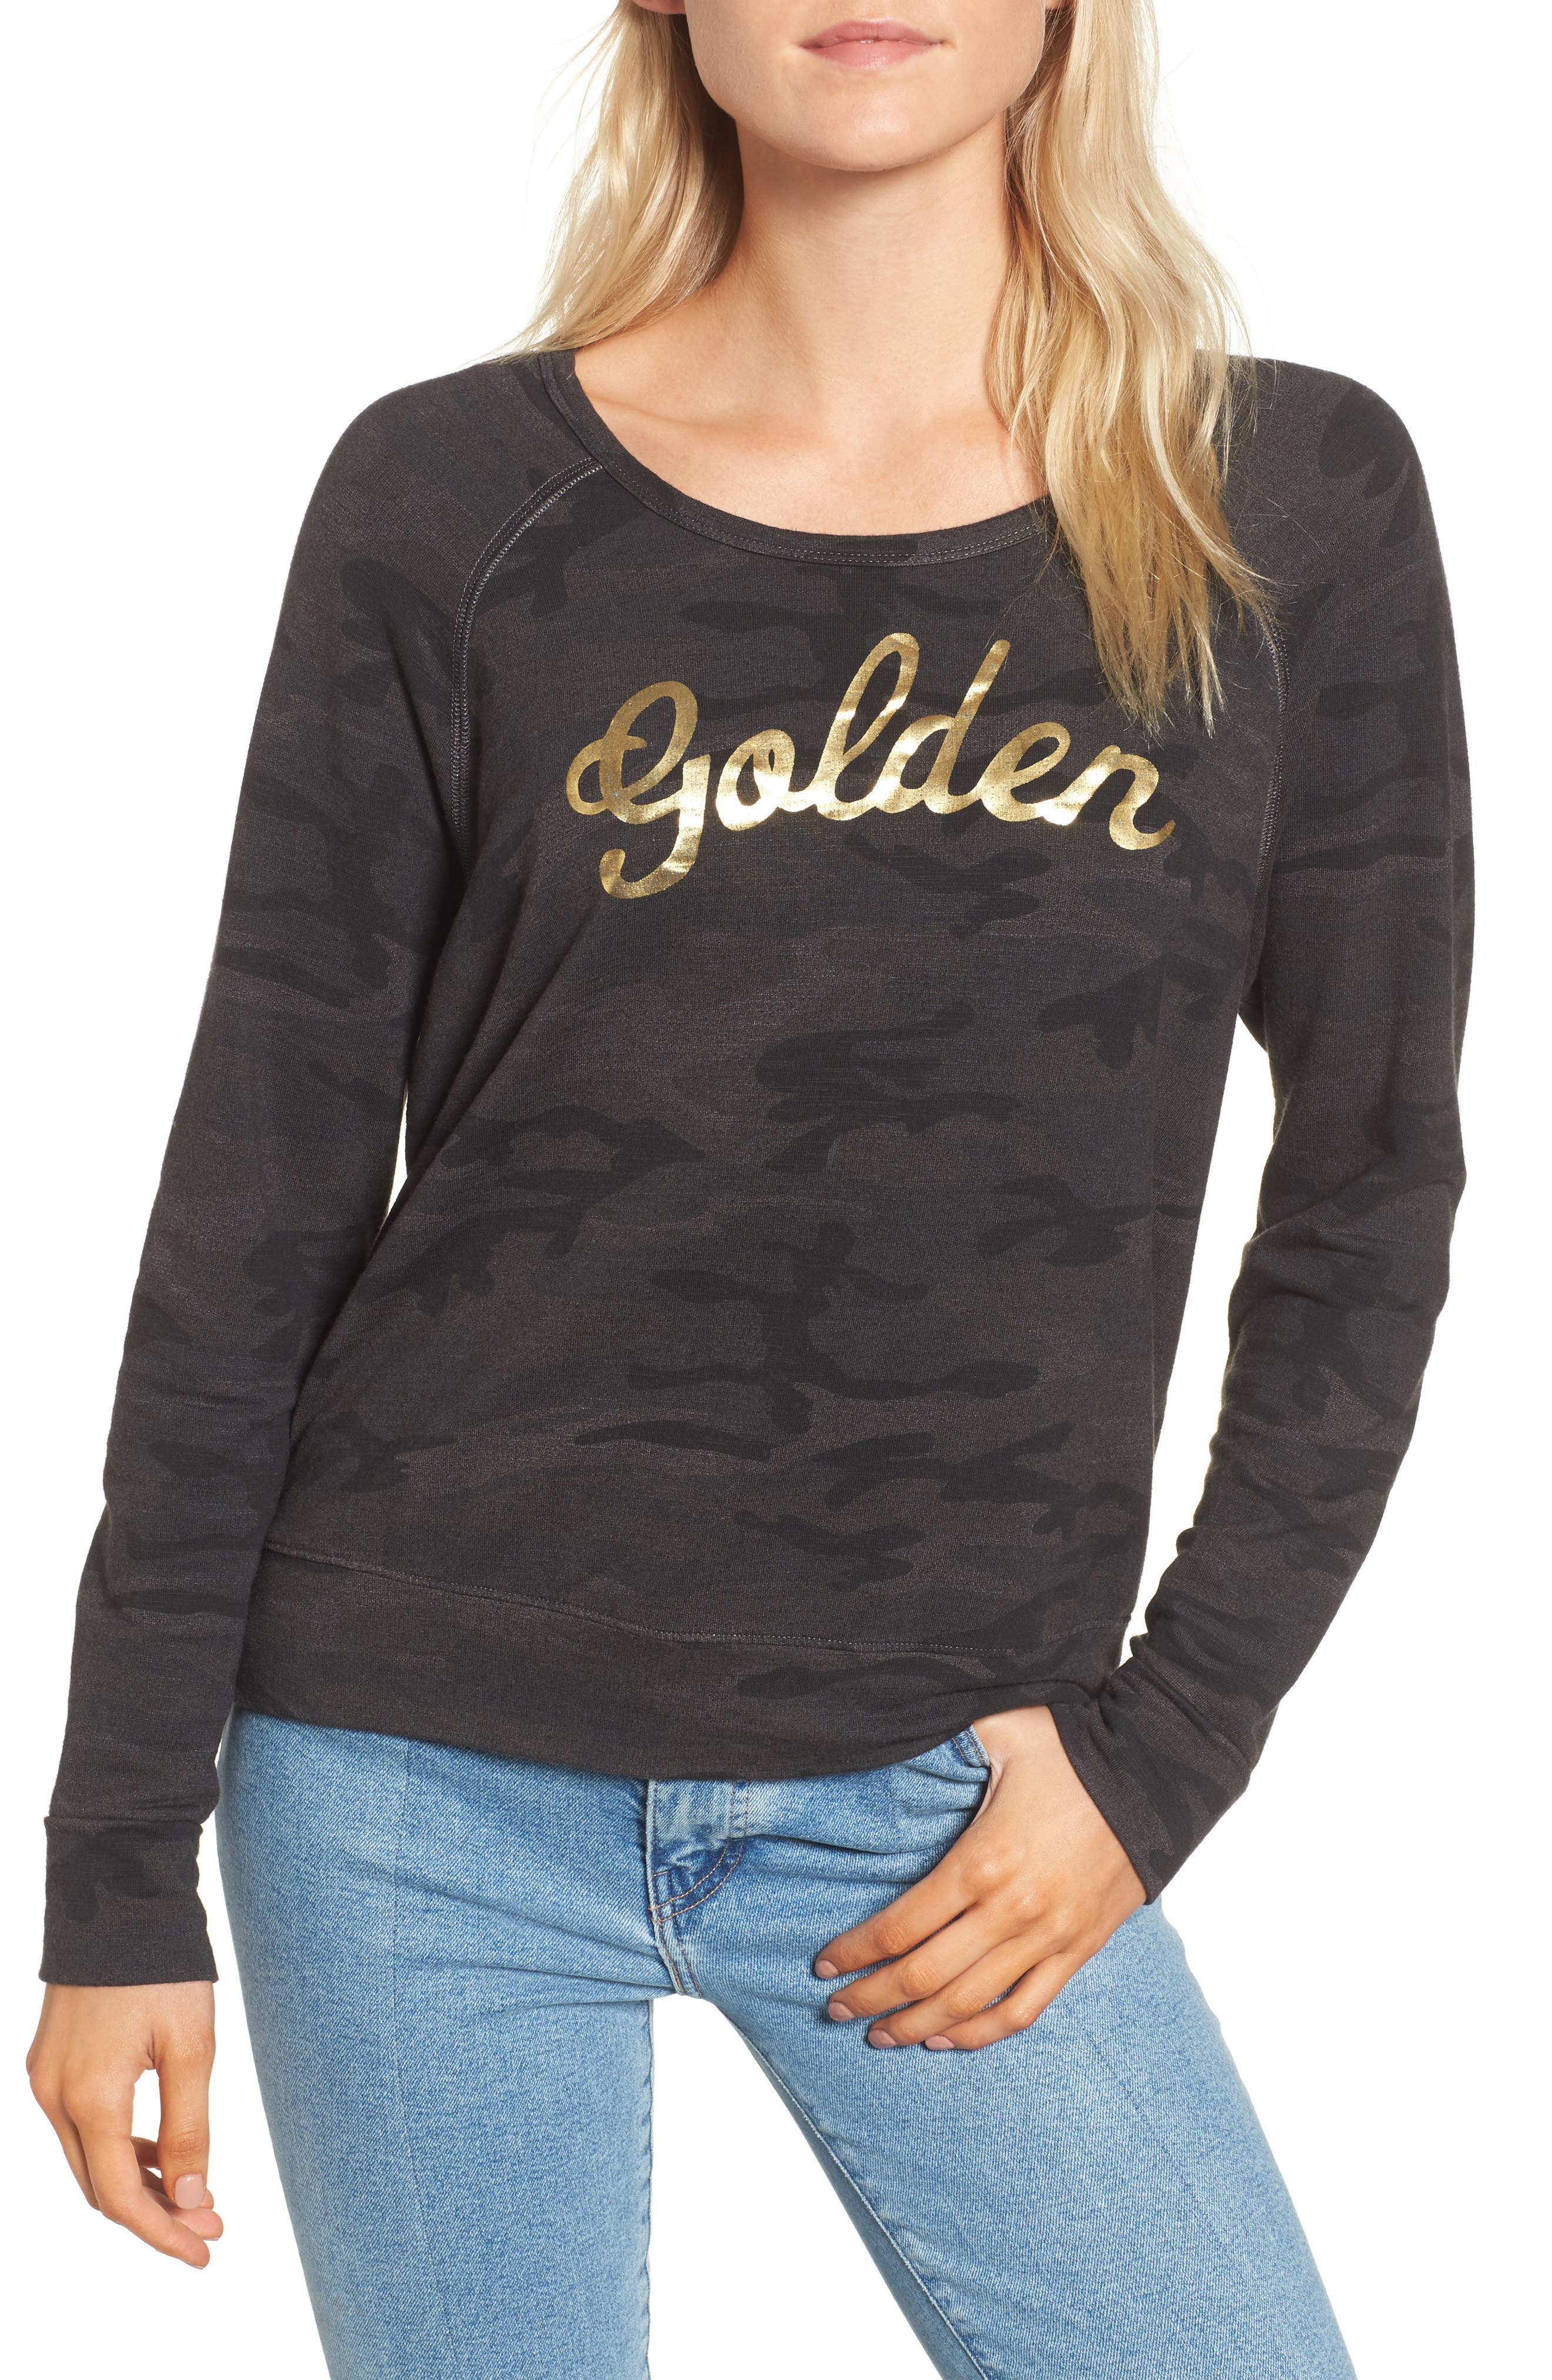 Active Golden Sweatshirt,                             Main thumbnail 1, color,                             Charcoal